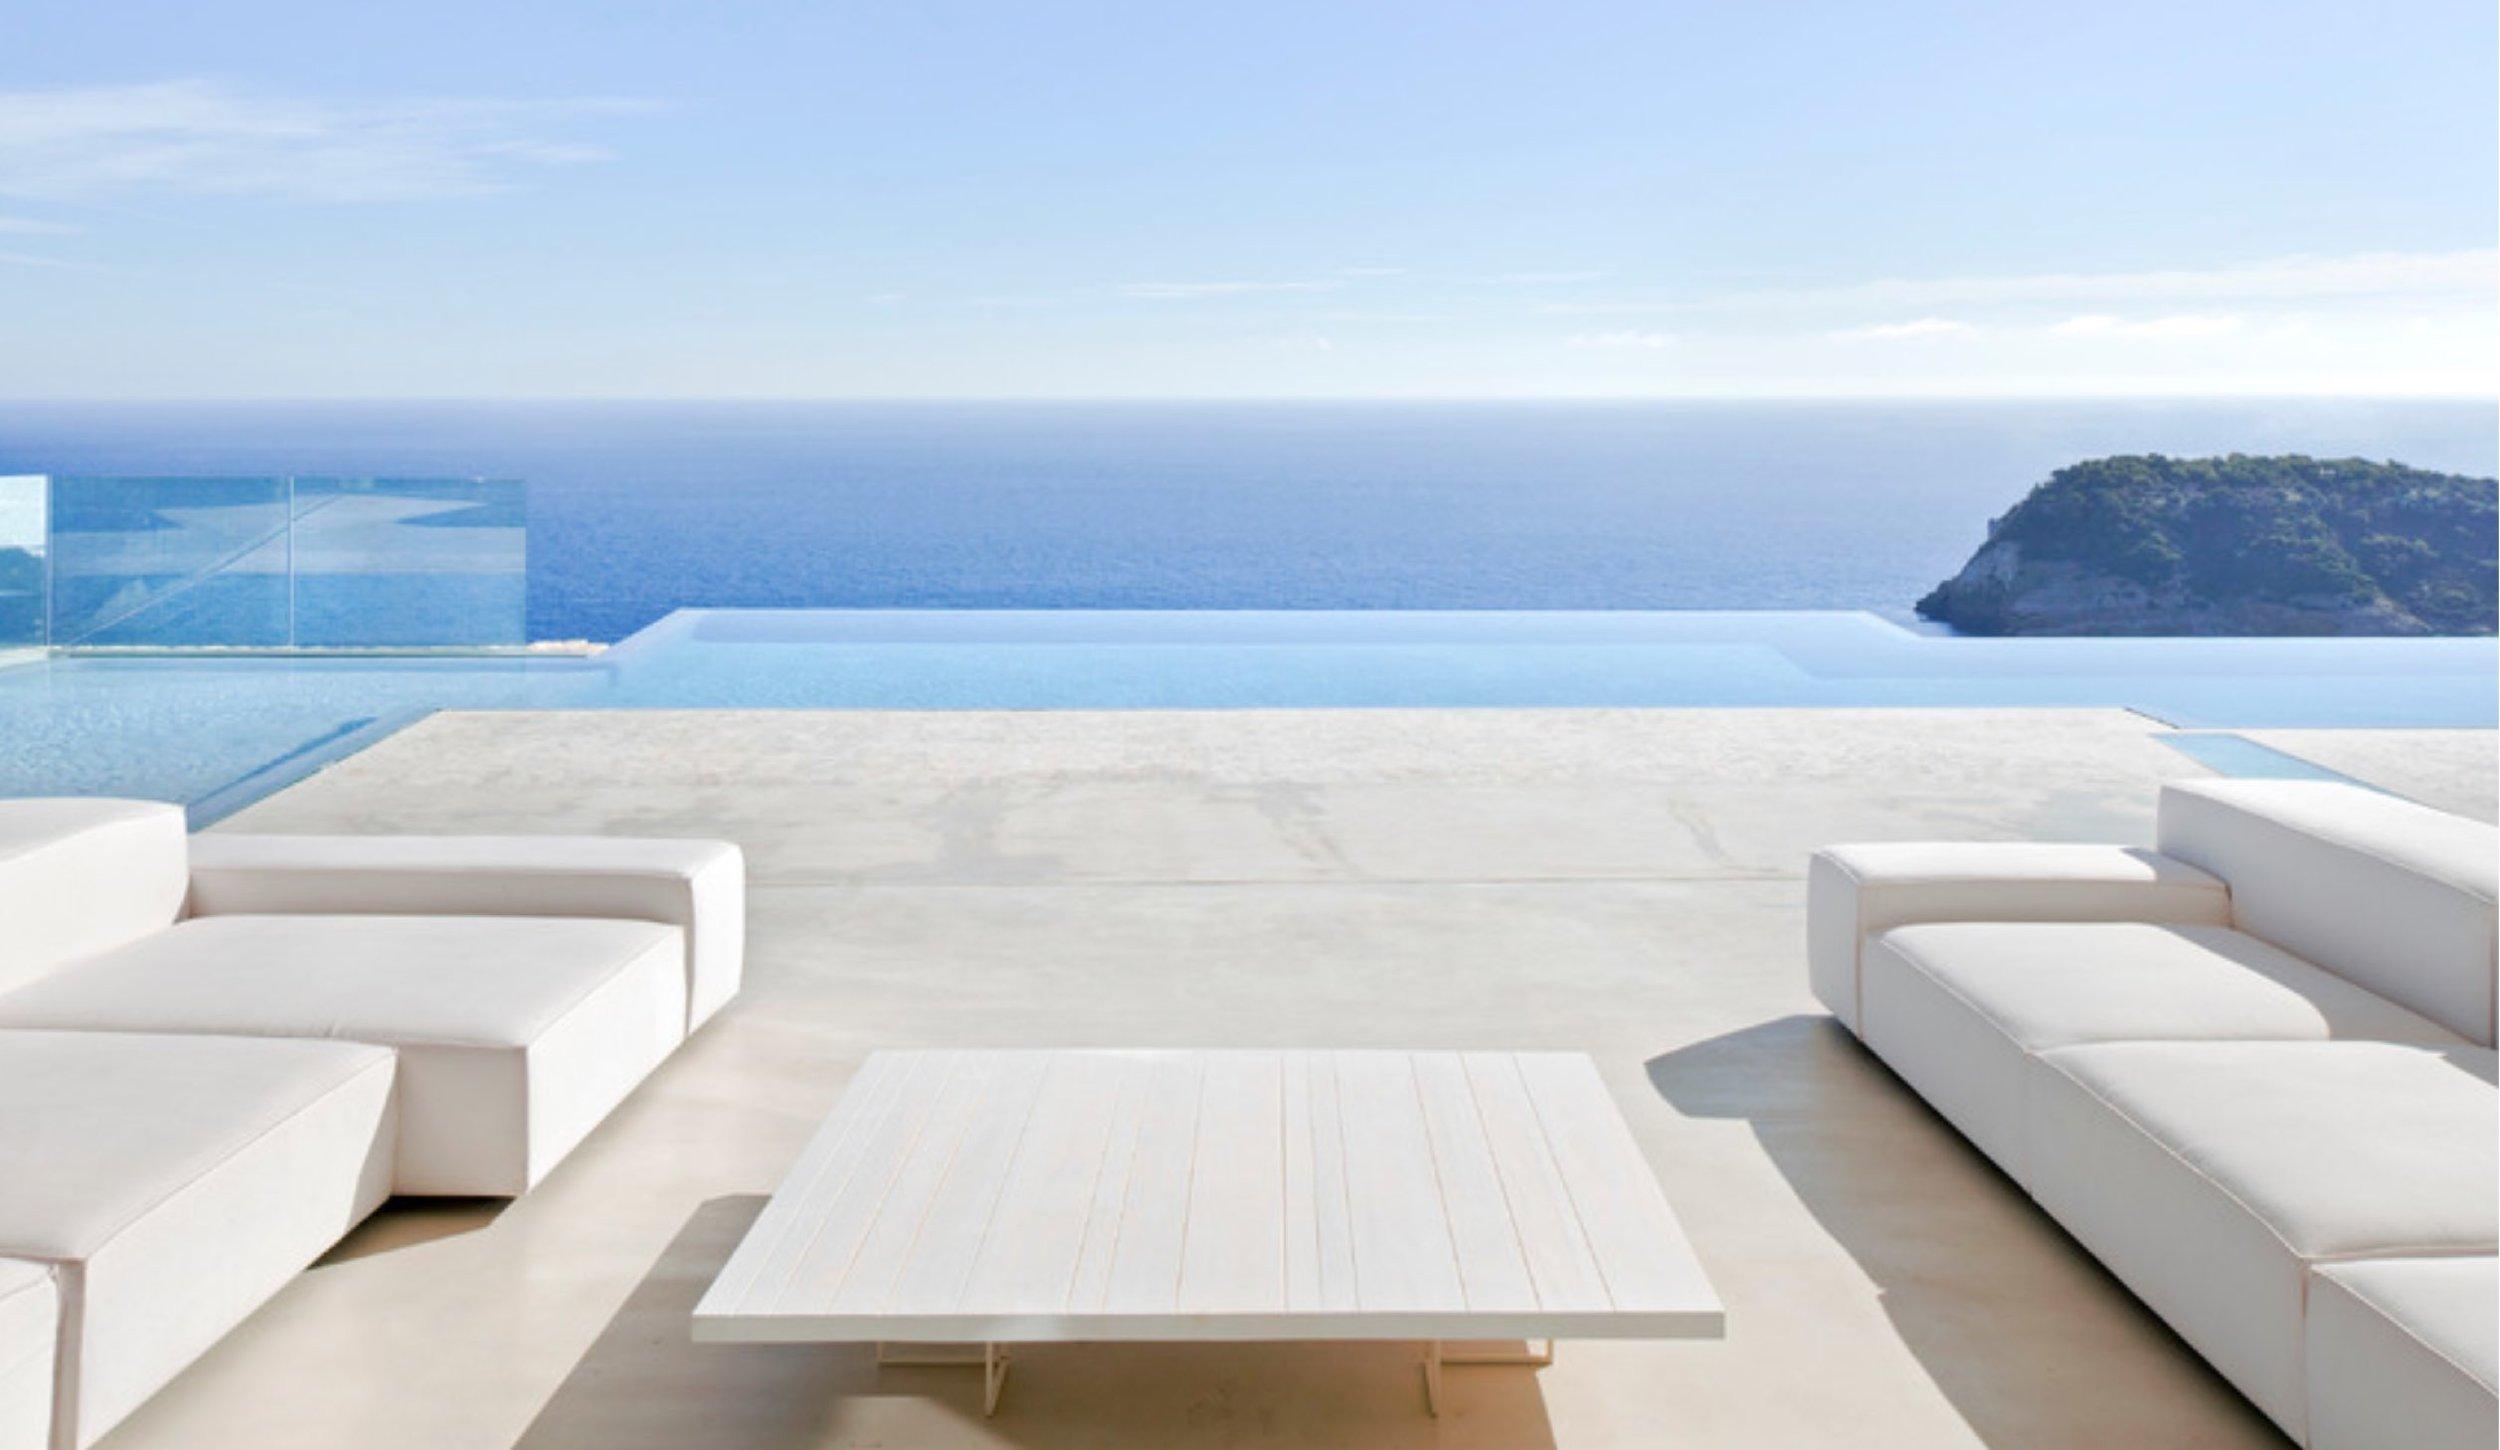 Luxury Outdoor Design Ideas & Remodel Photos | Houzz-3.jpg